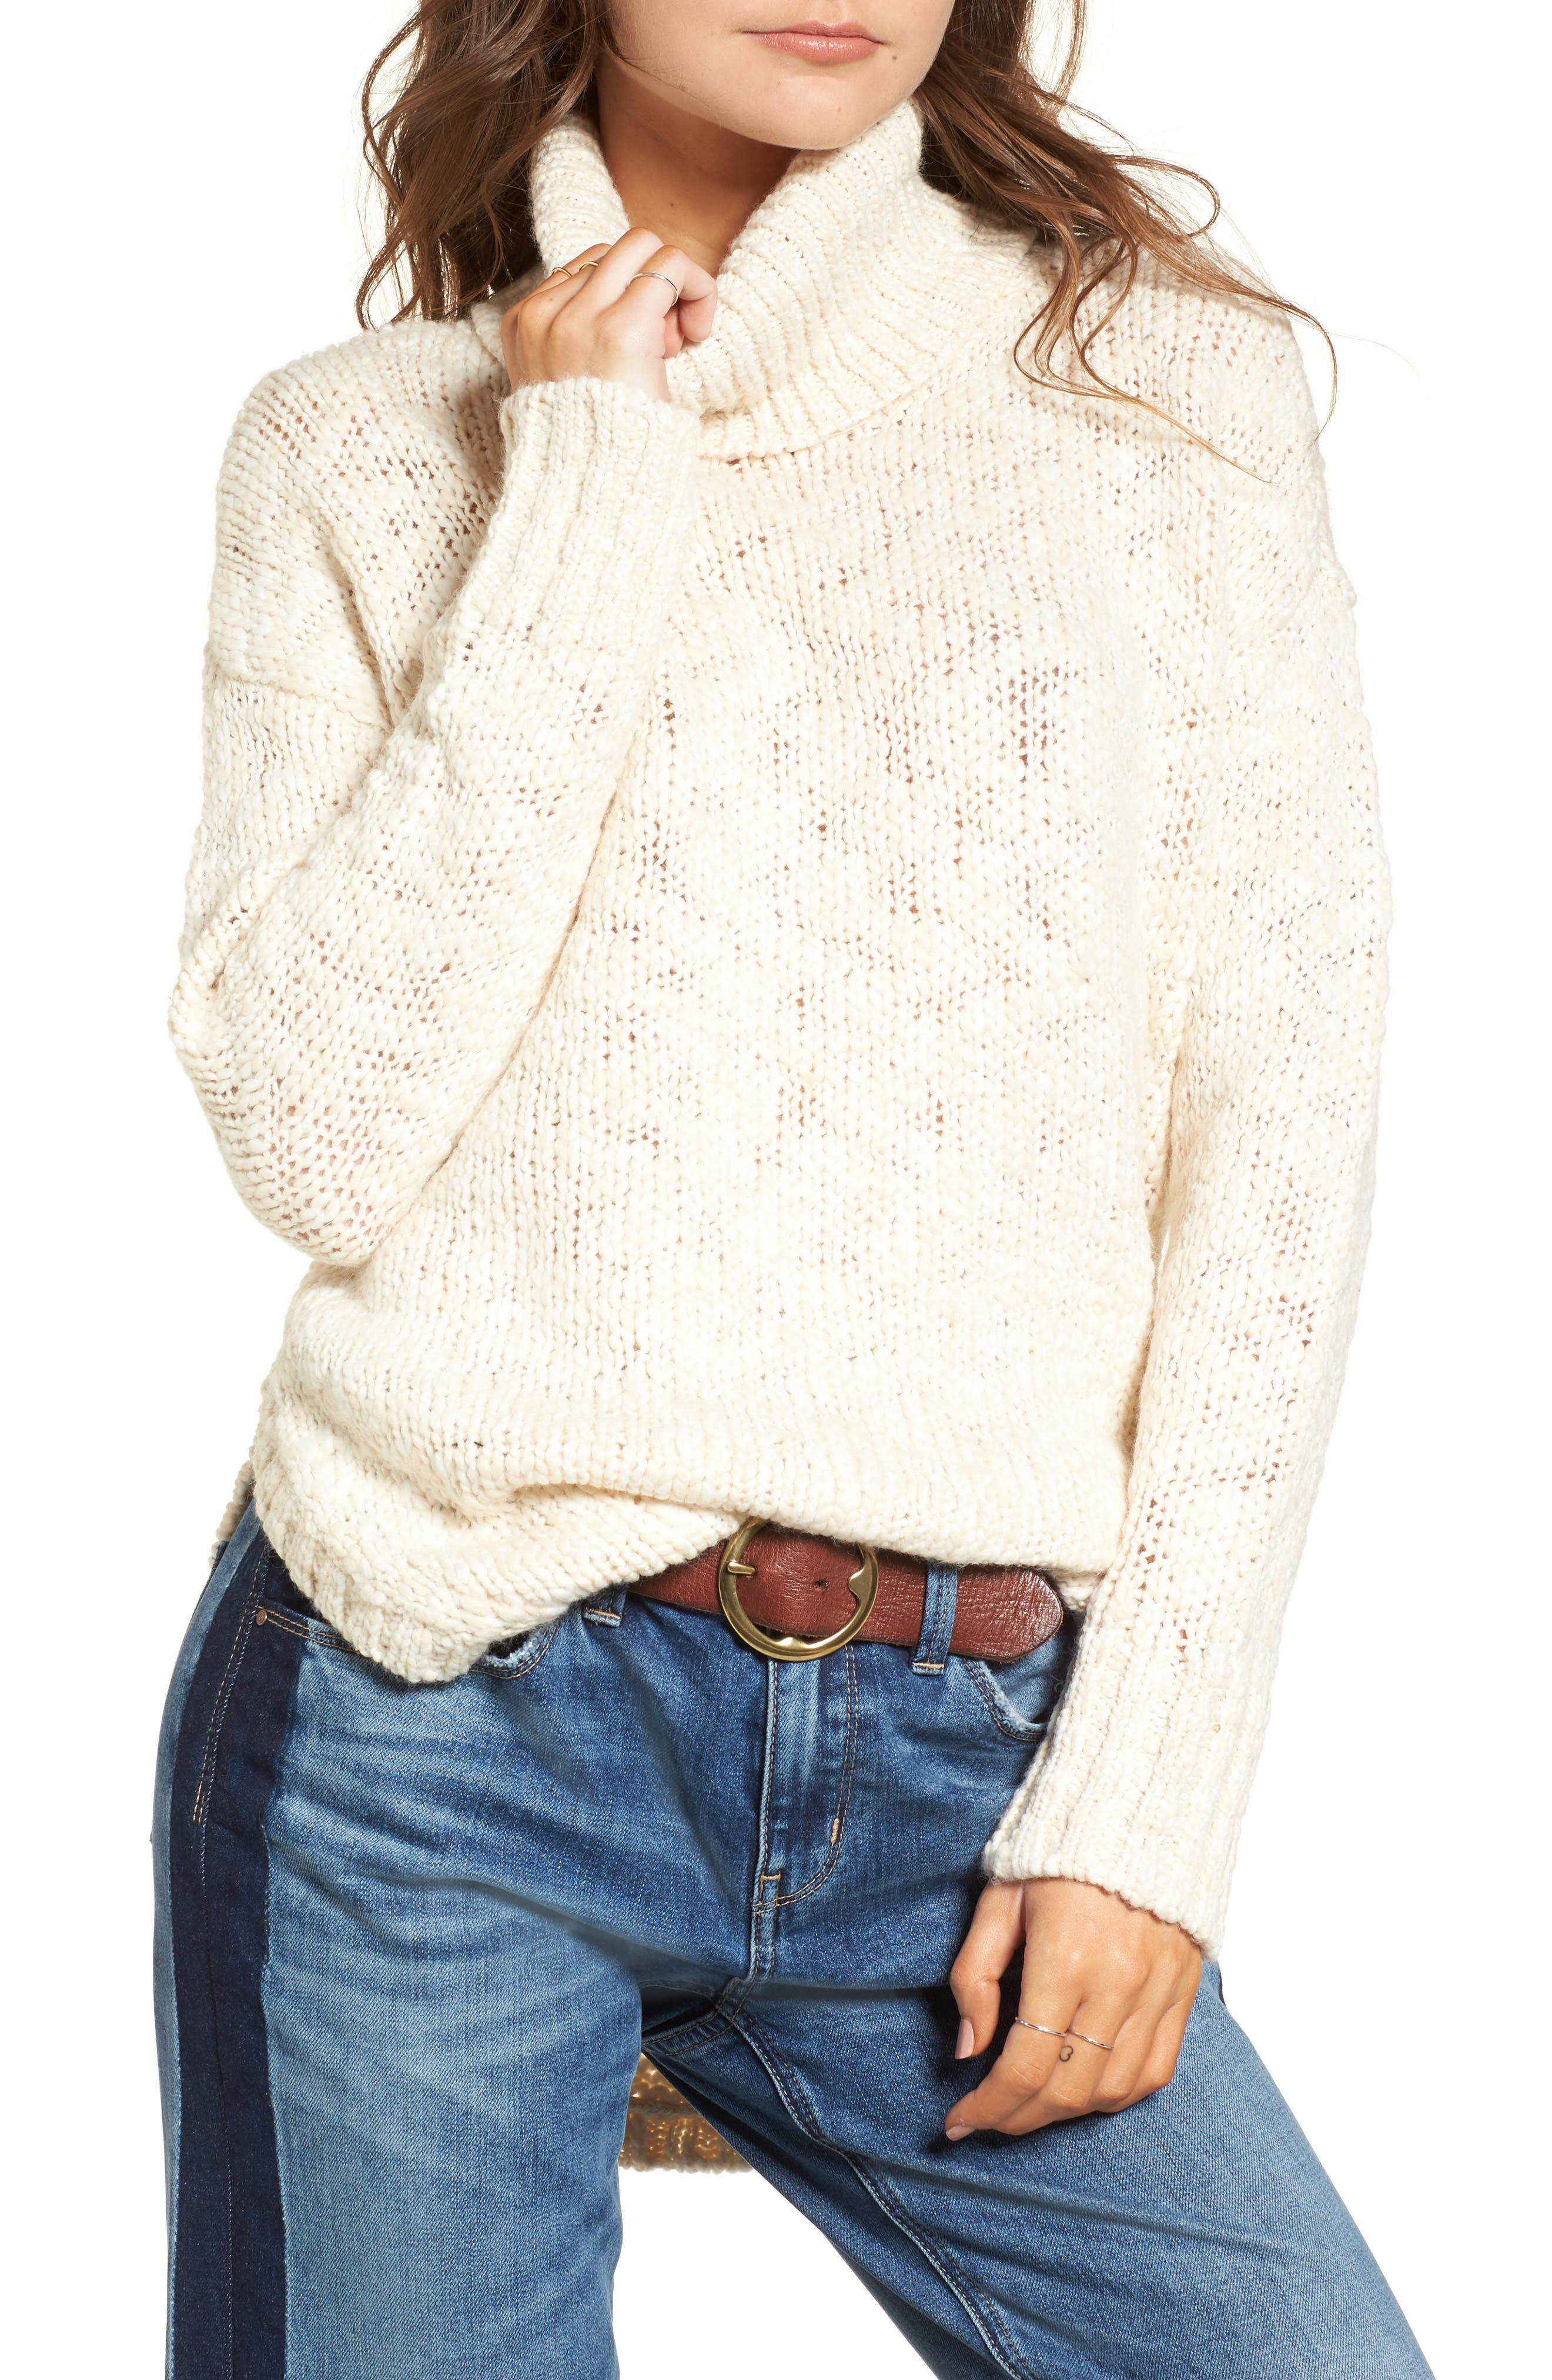 Treasure&Bond Turtleneck Sweater,                             Main thumbnail 1, color,                             BEIGE BEACH COMBO